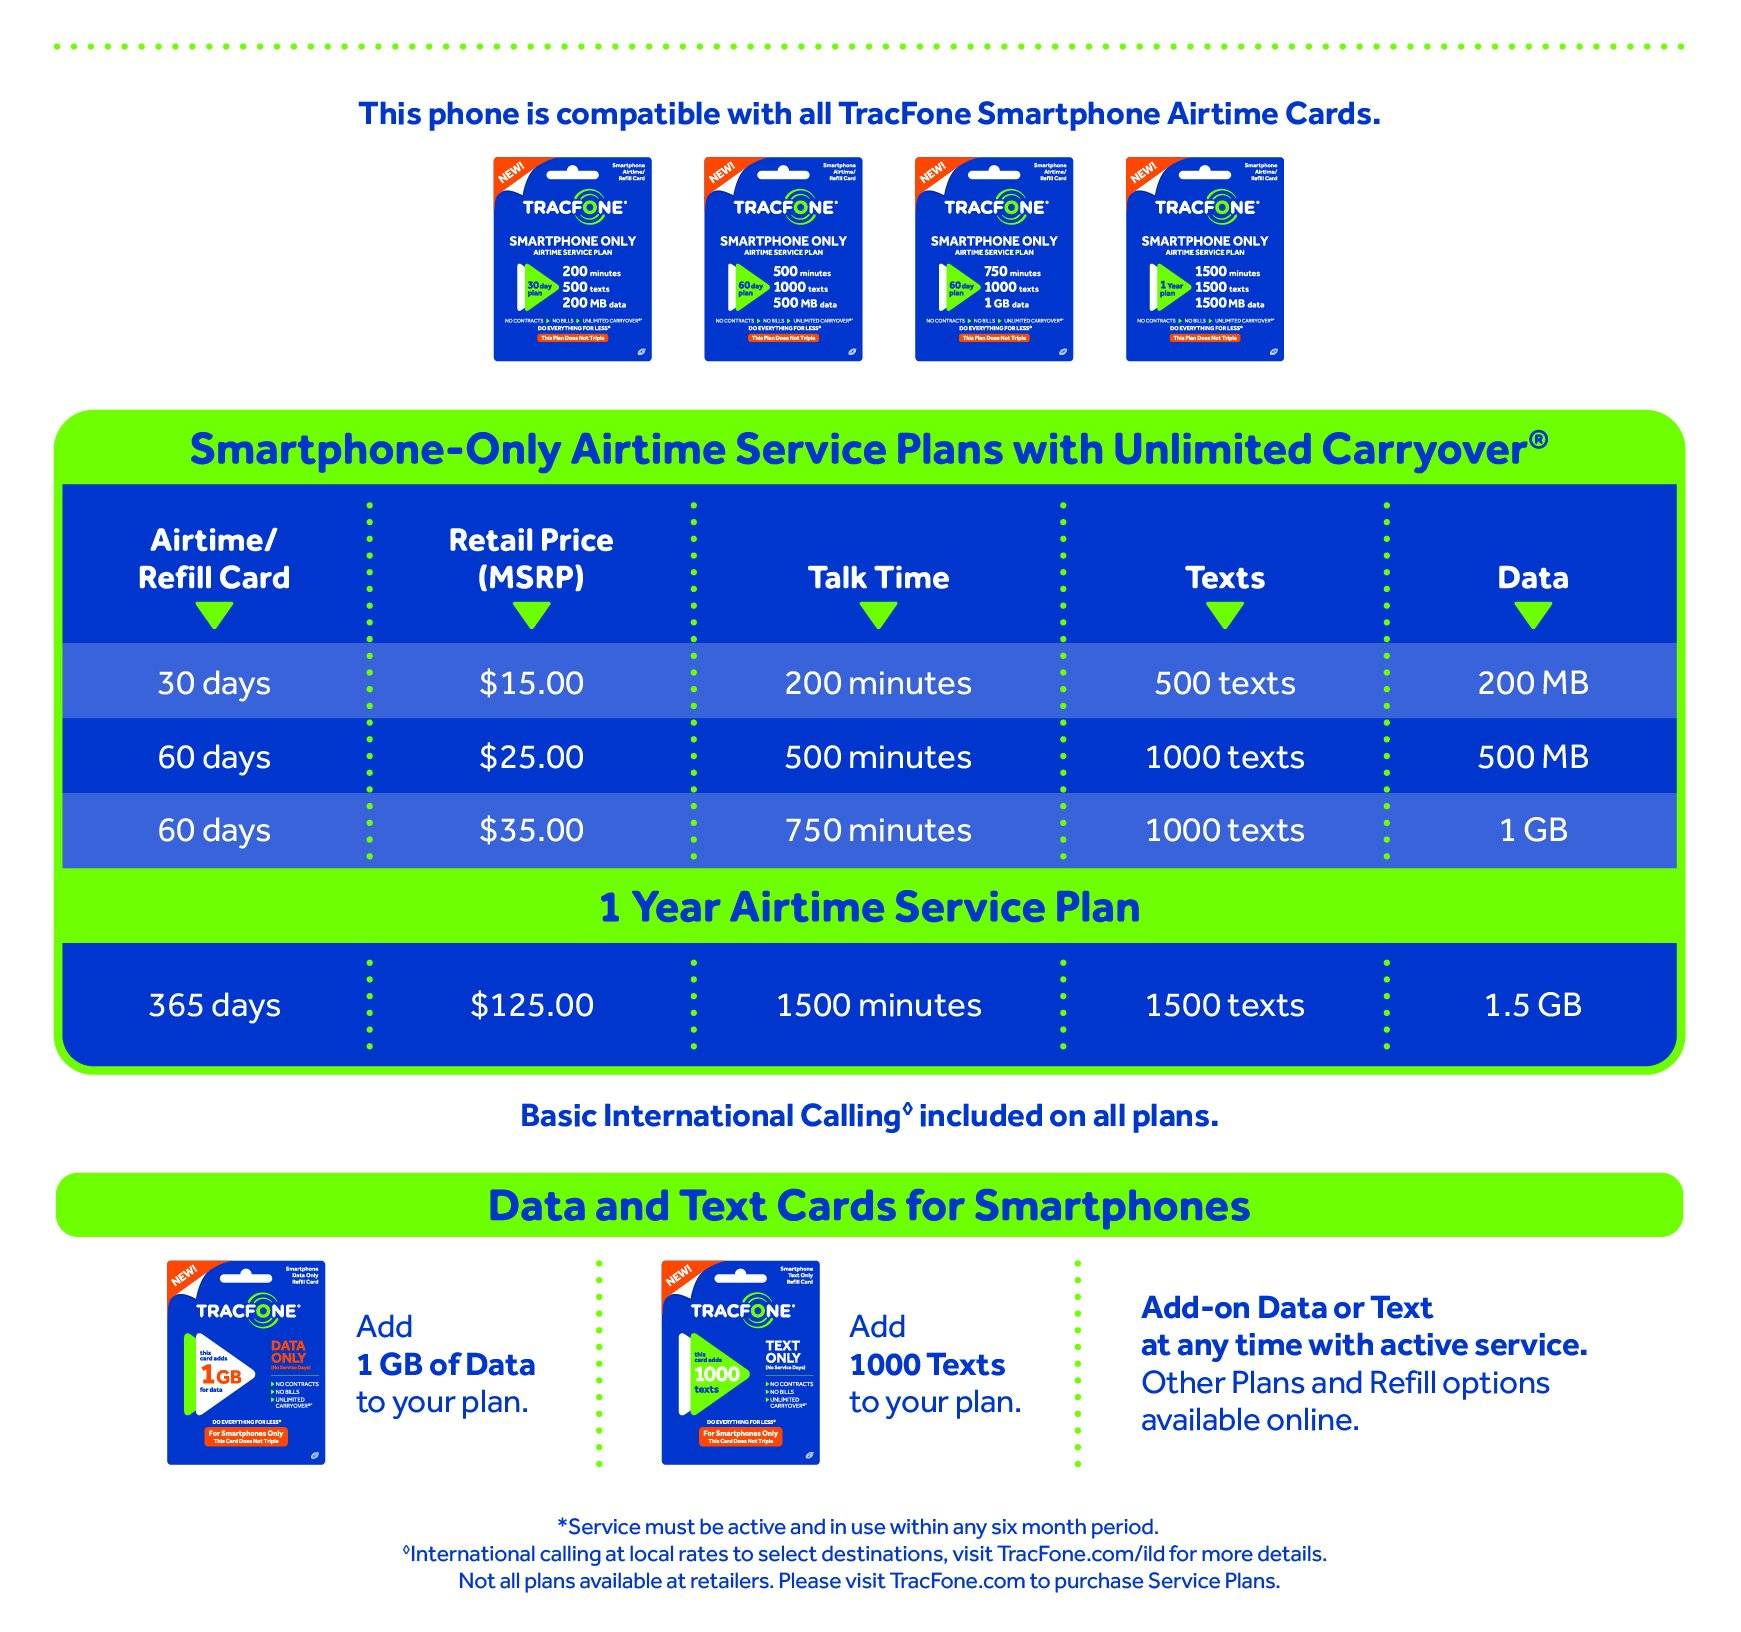 TracFone Samsung Galaxy J1 Luna 4G LTE Prepaid Smartphone with Free $30 Airtime Bundle